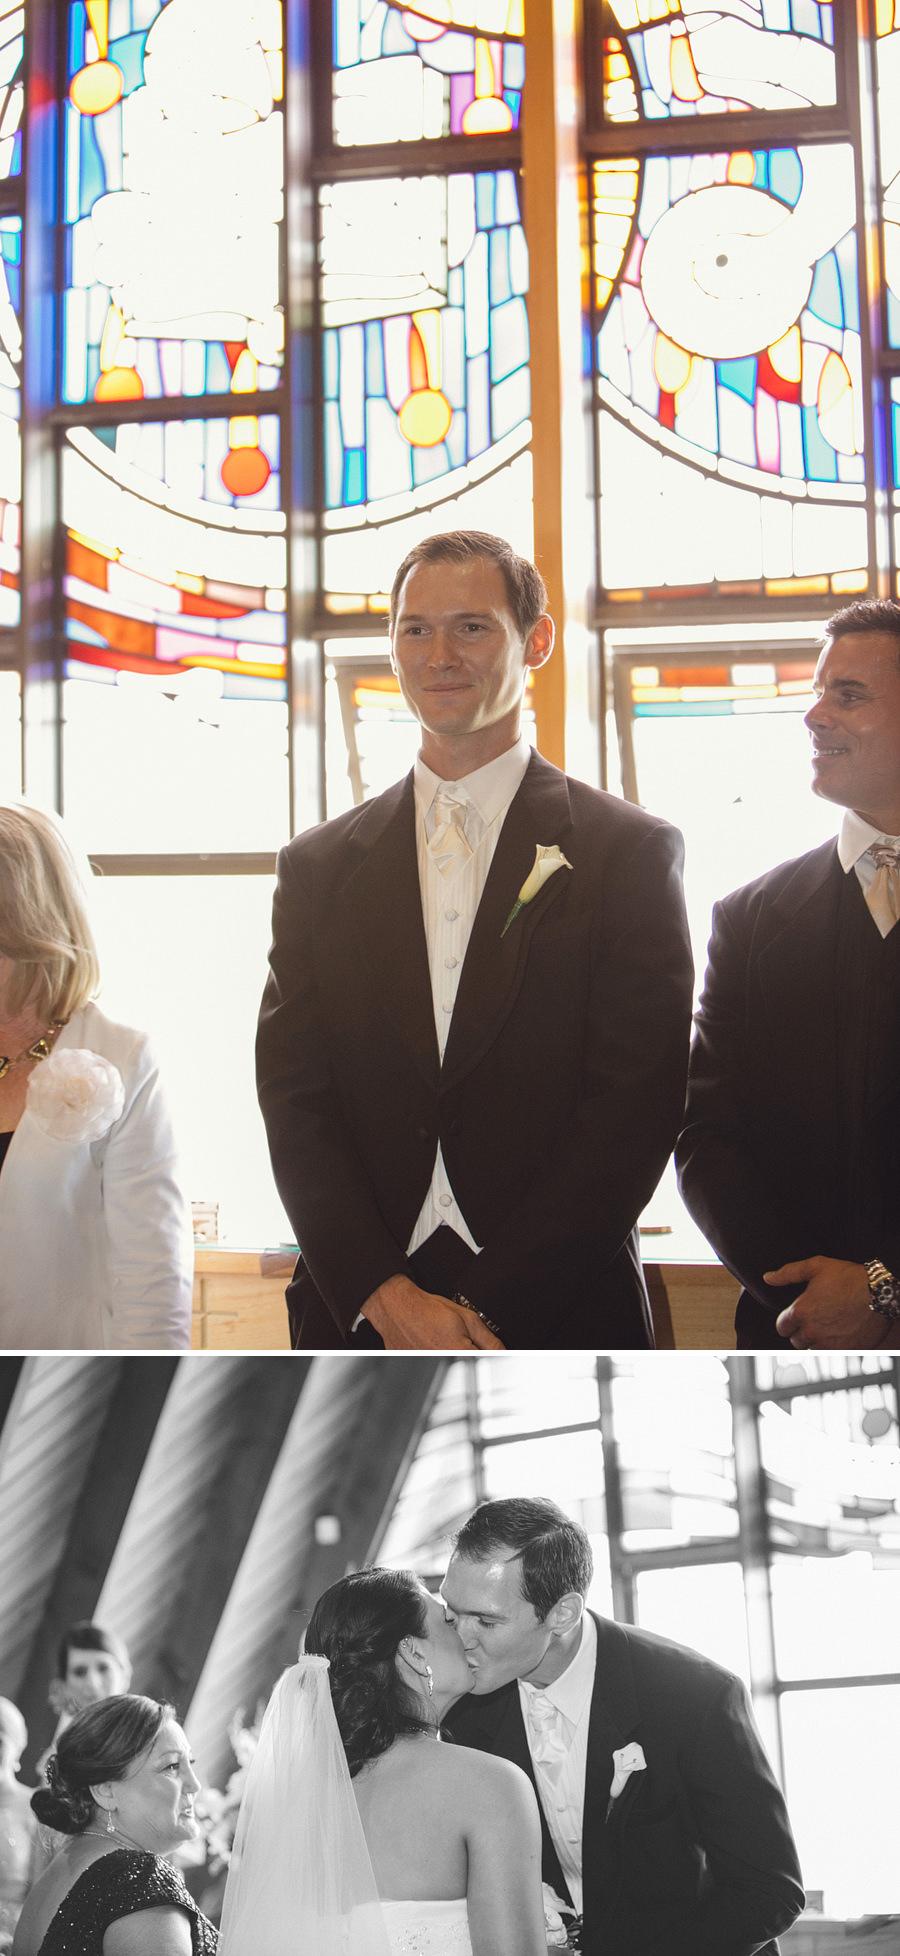 Little Bay Chapel Wedding Photography: Ceremony